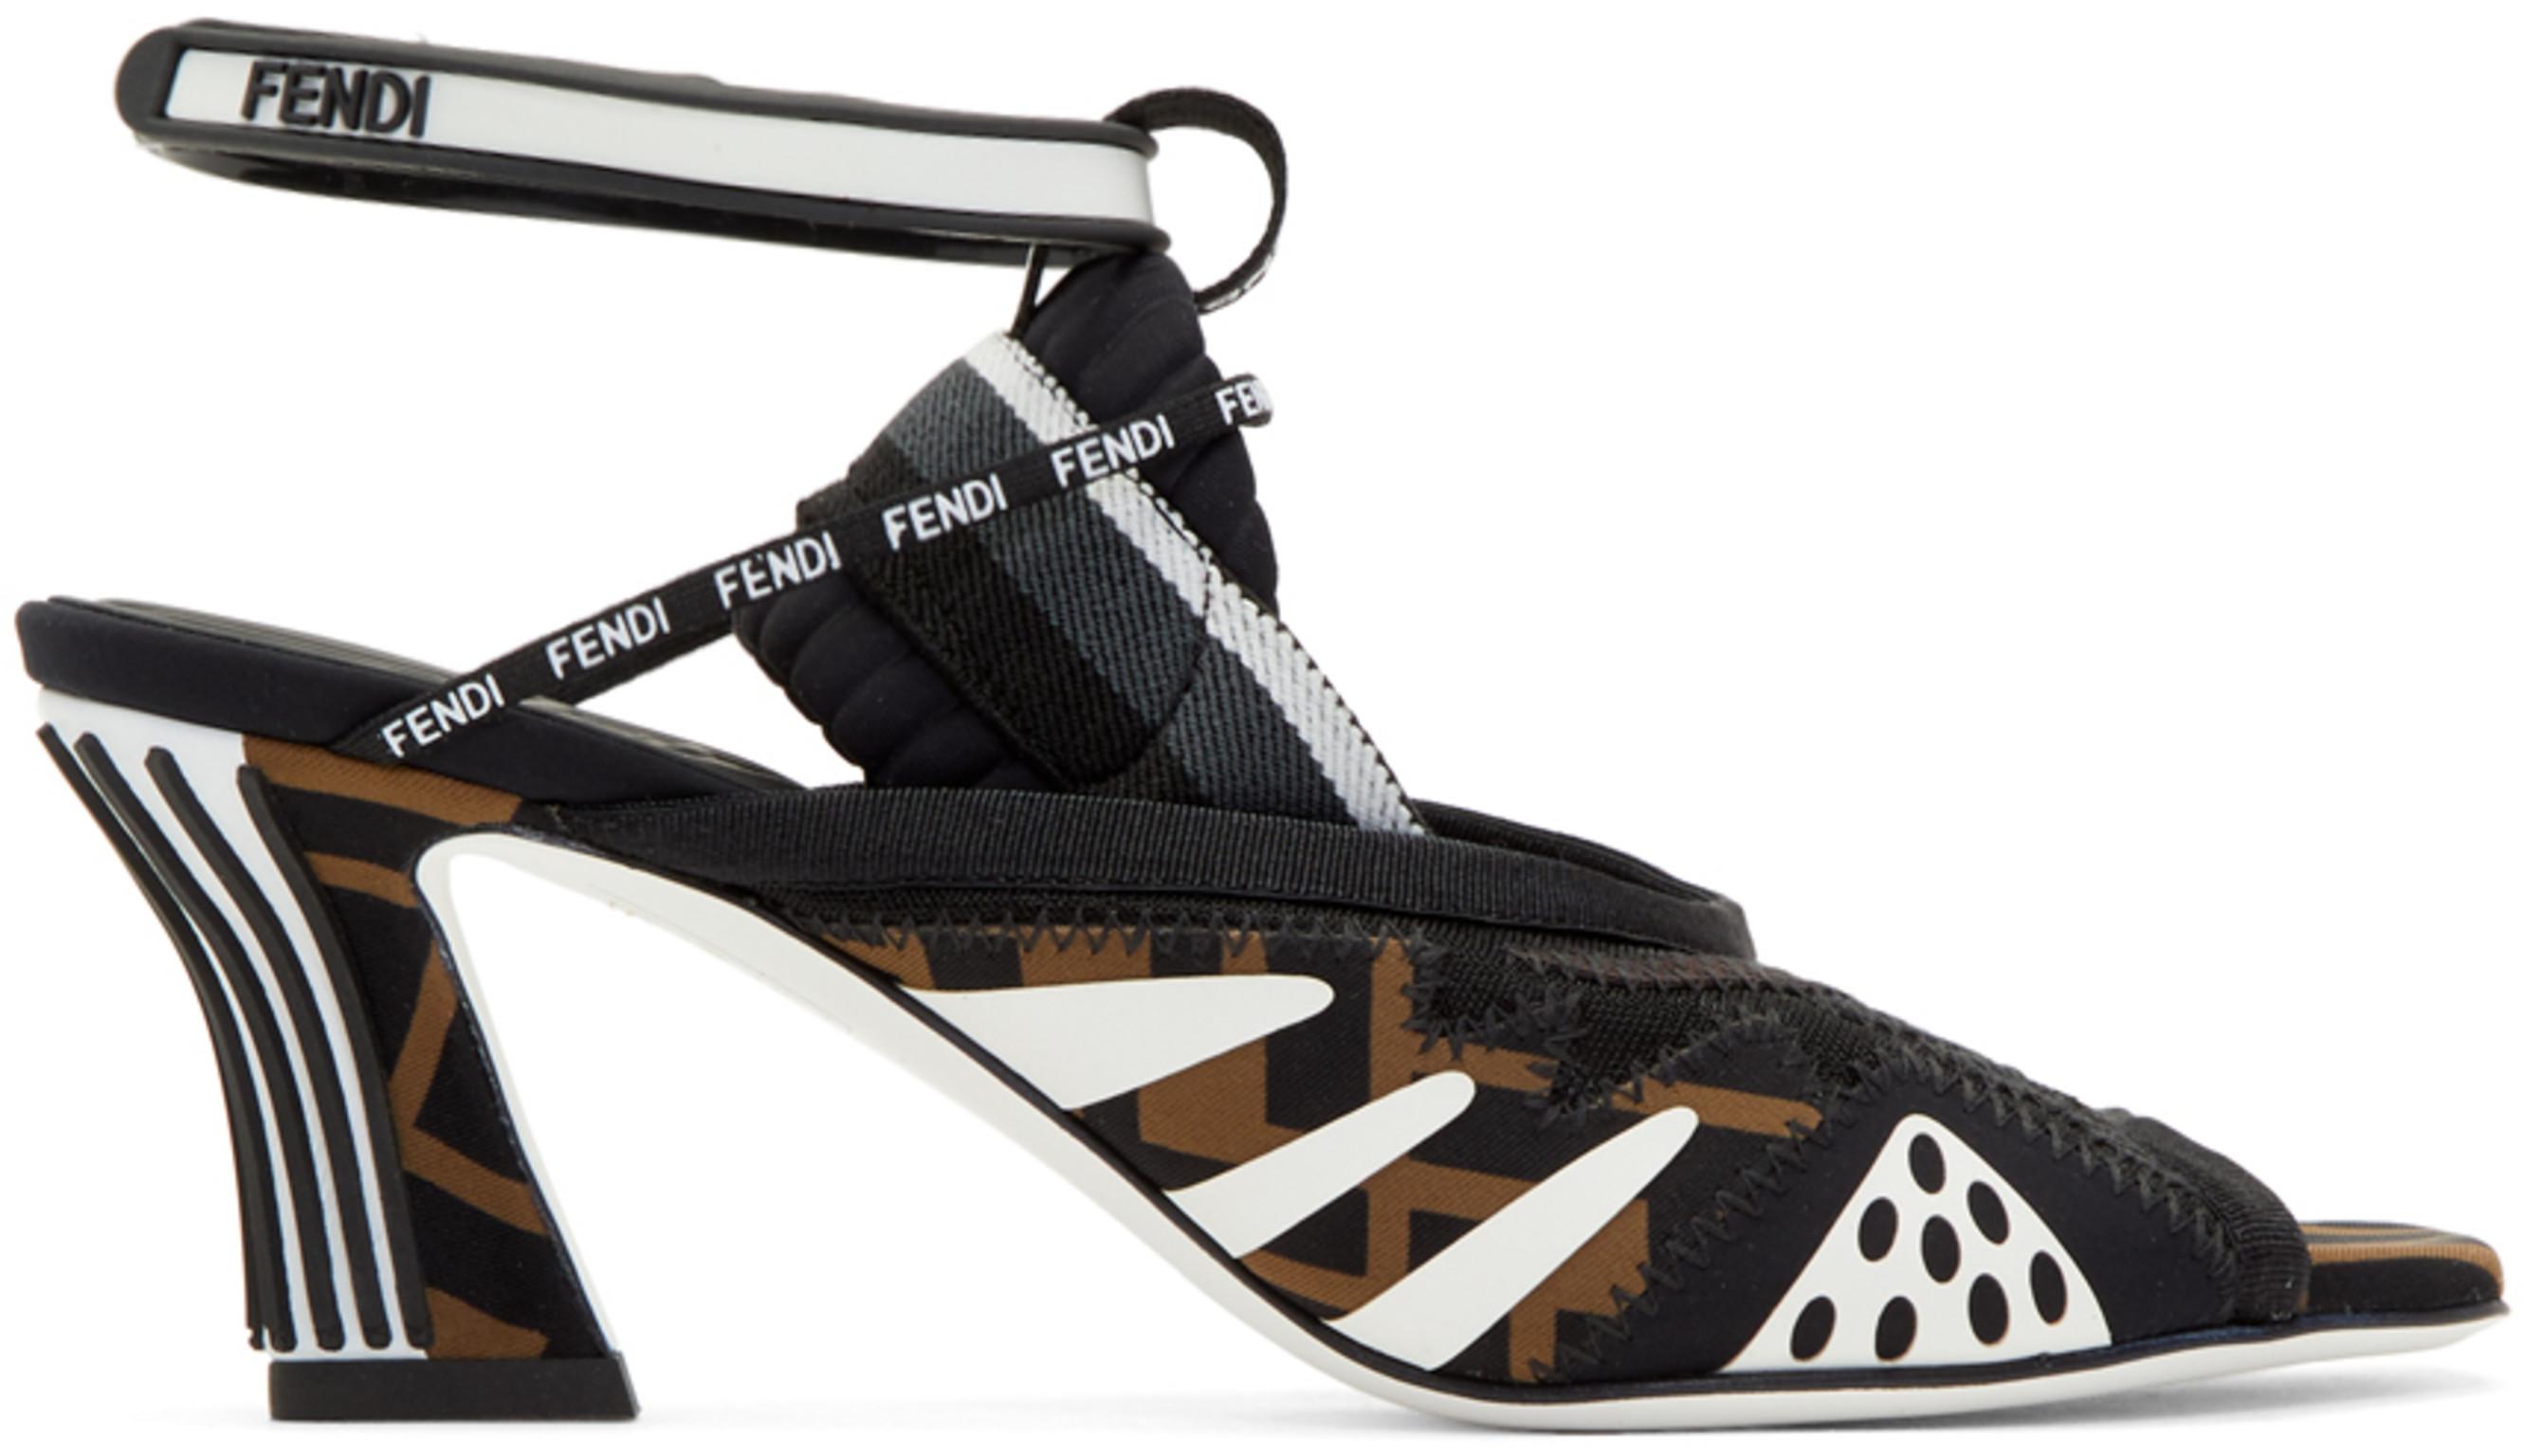 15f4c52da8e7 Fendi sandals for Women